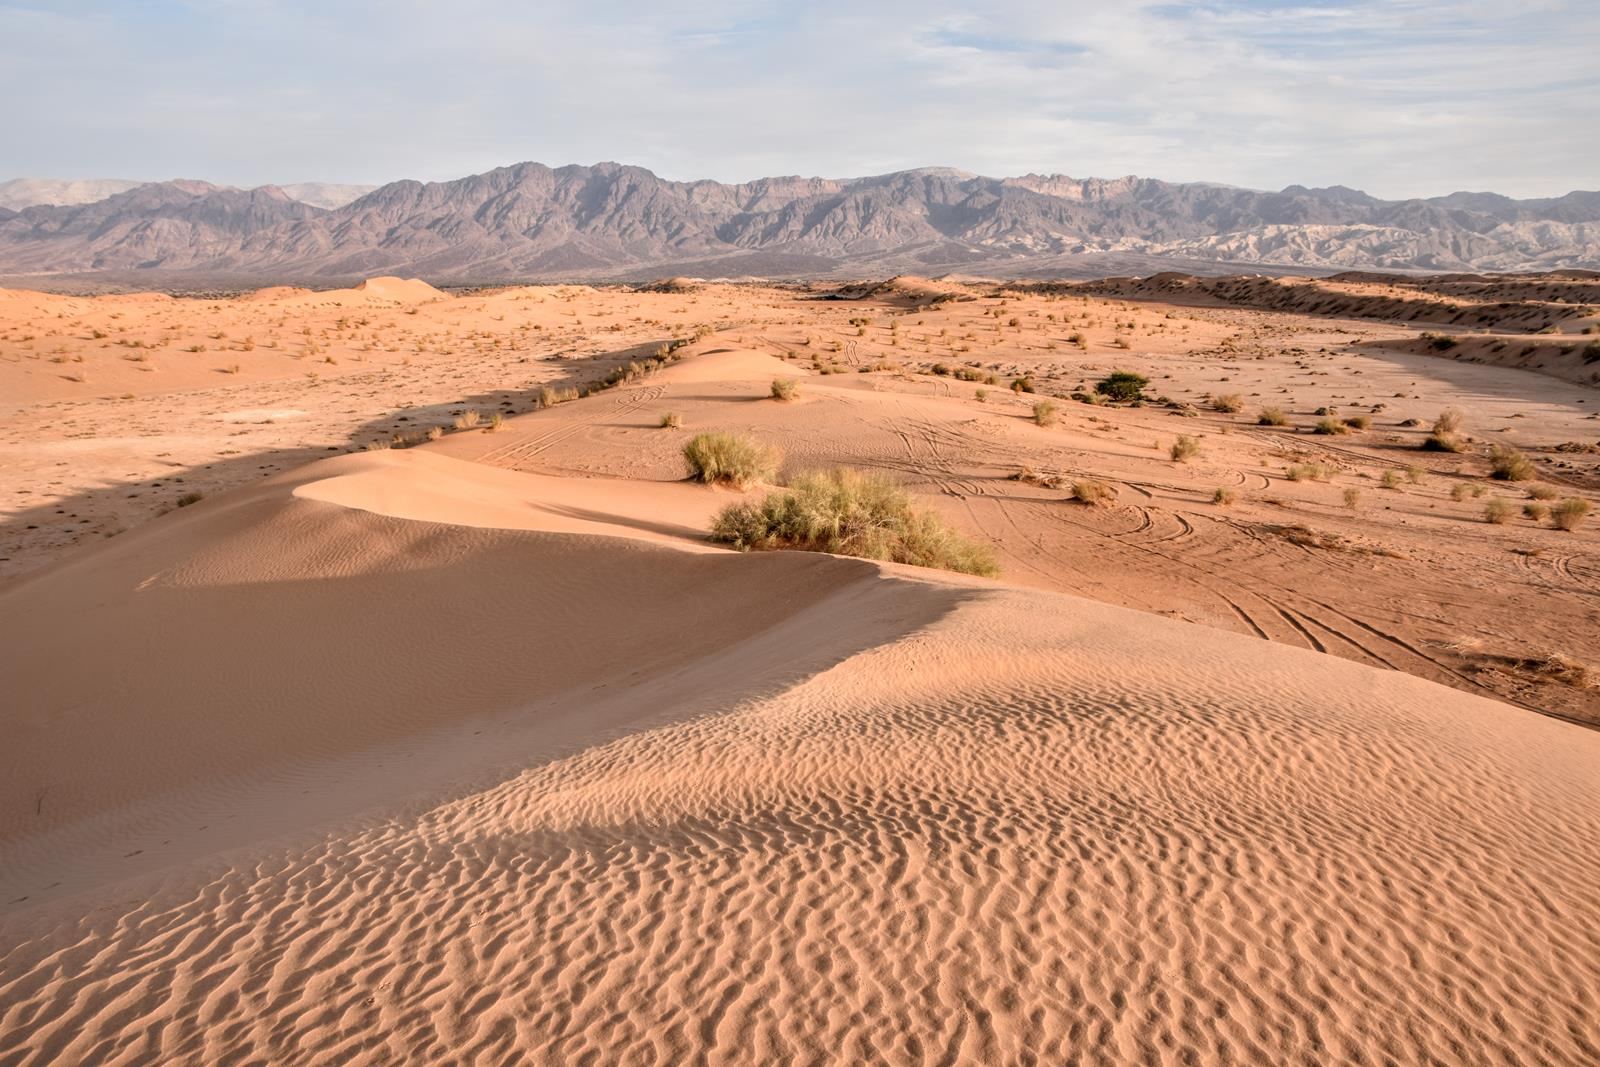 Wadi Araba | Jordan (لأردن Al-Urdunn, Jordania)